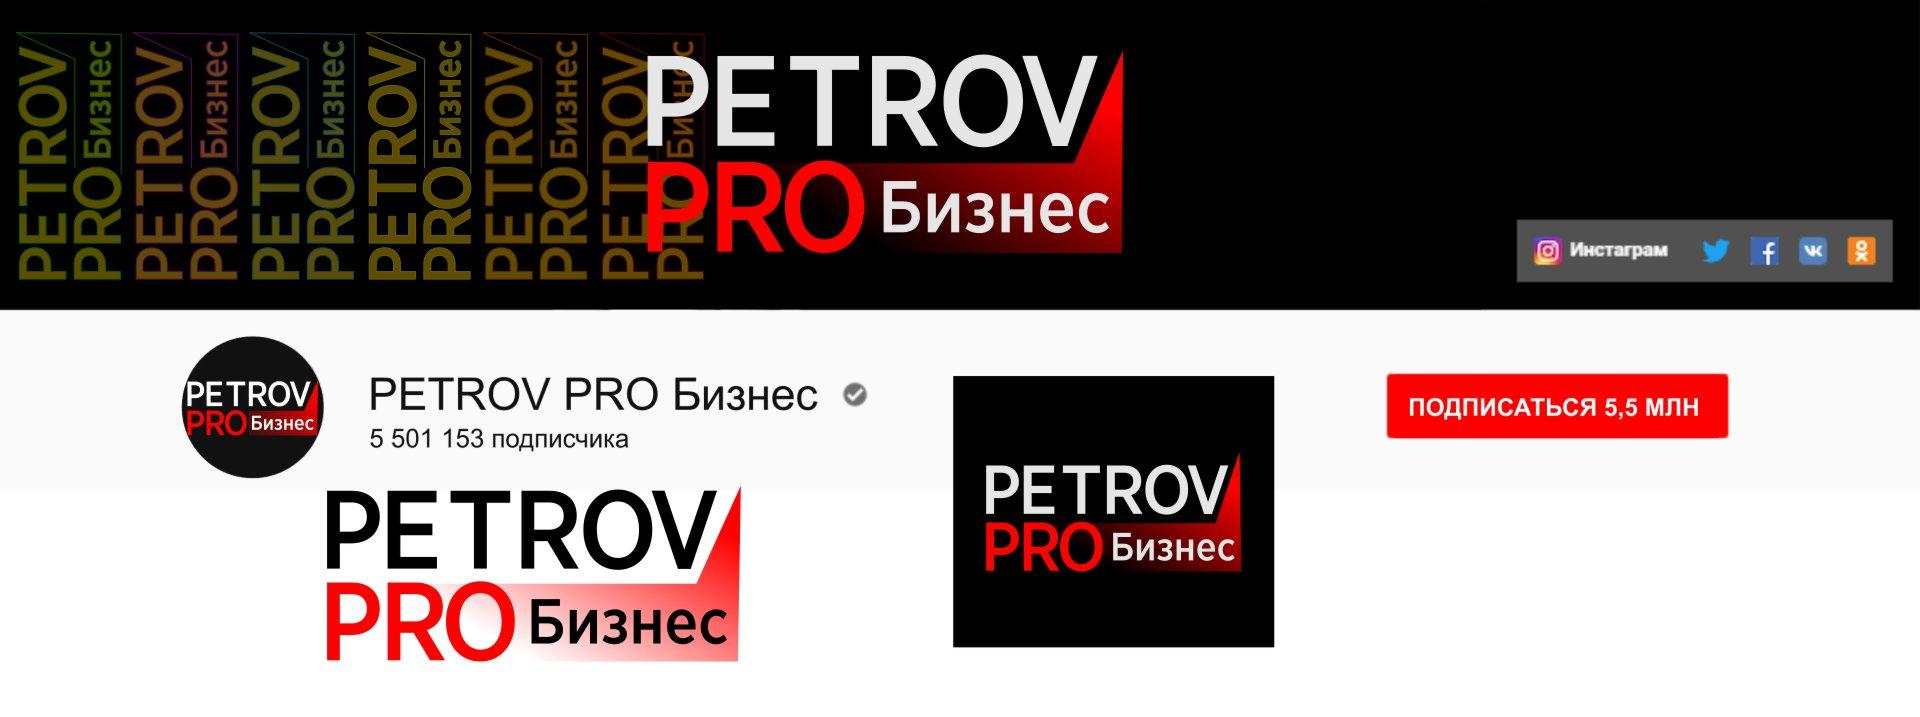 Создать логотип для YouTube канала  фото f_4965bfe68a71cfbc.jpg